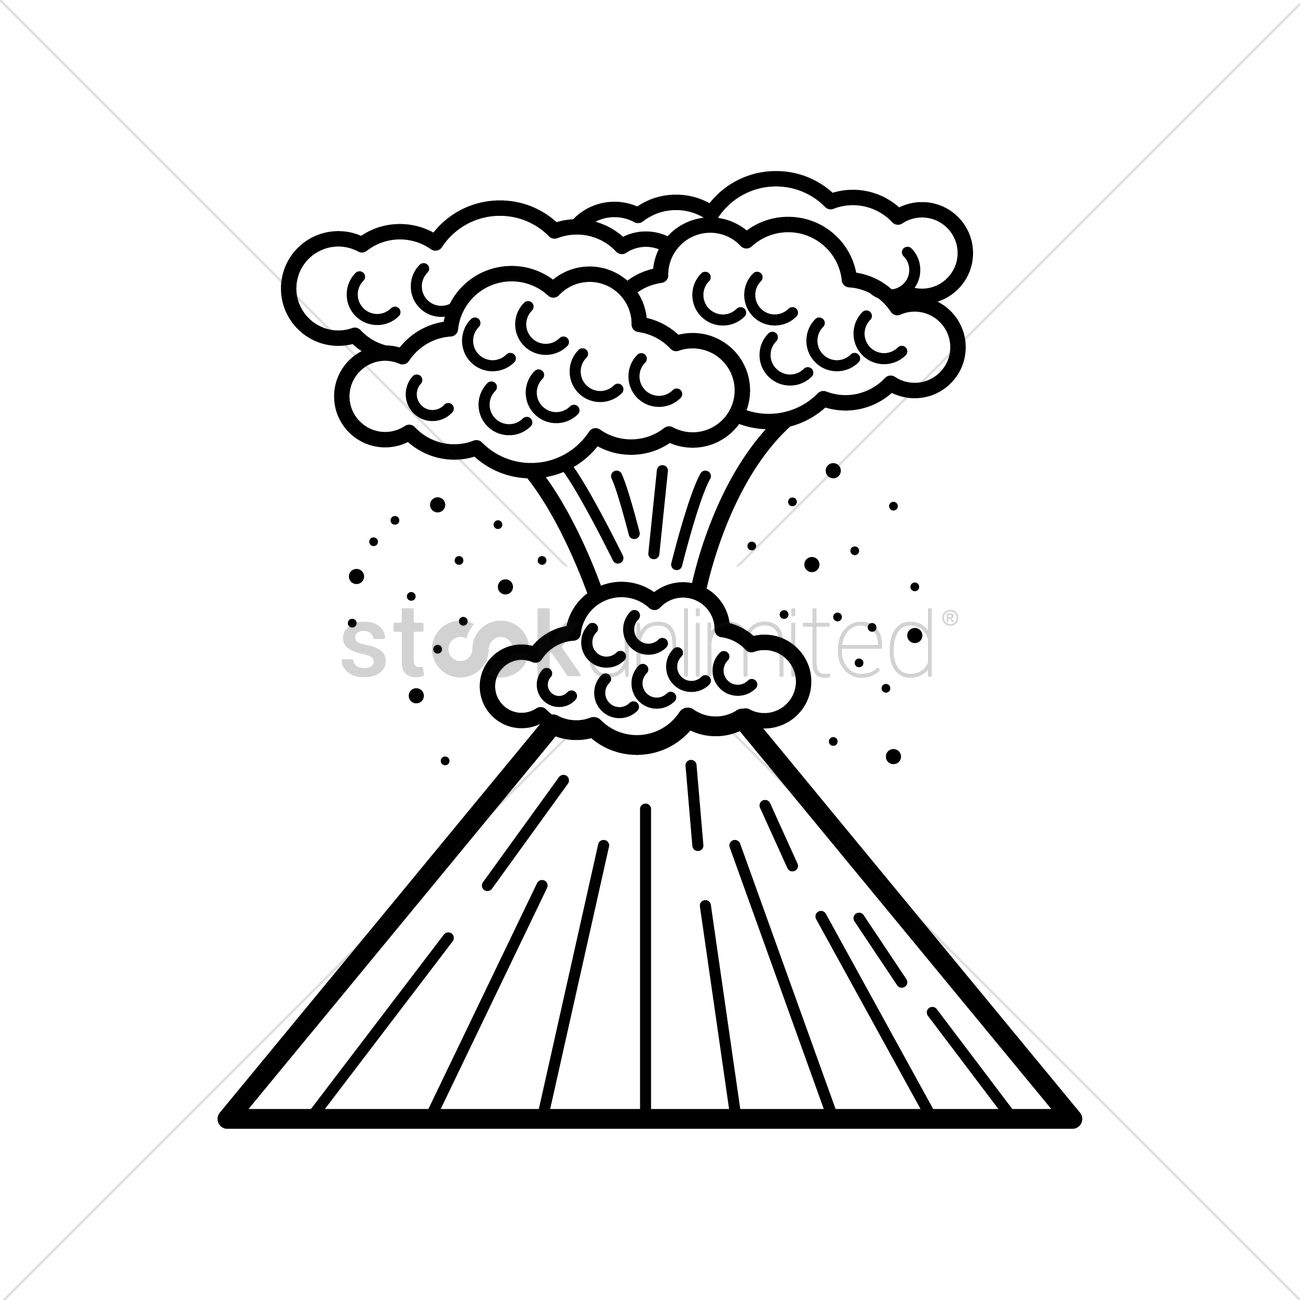 Volcanic eruption vector image 1999418 stockunlimited volcanic eruption vector graphic pronofoot35fo Images